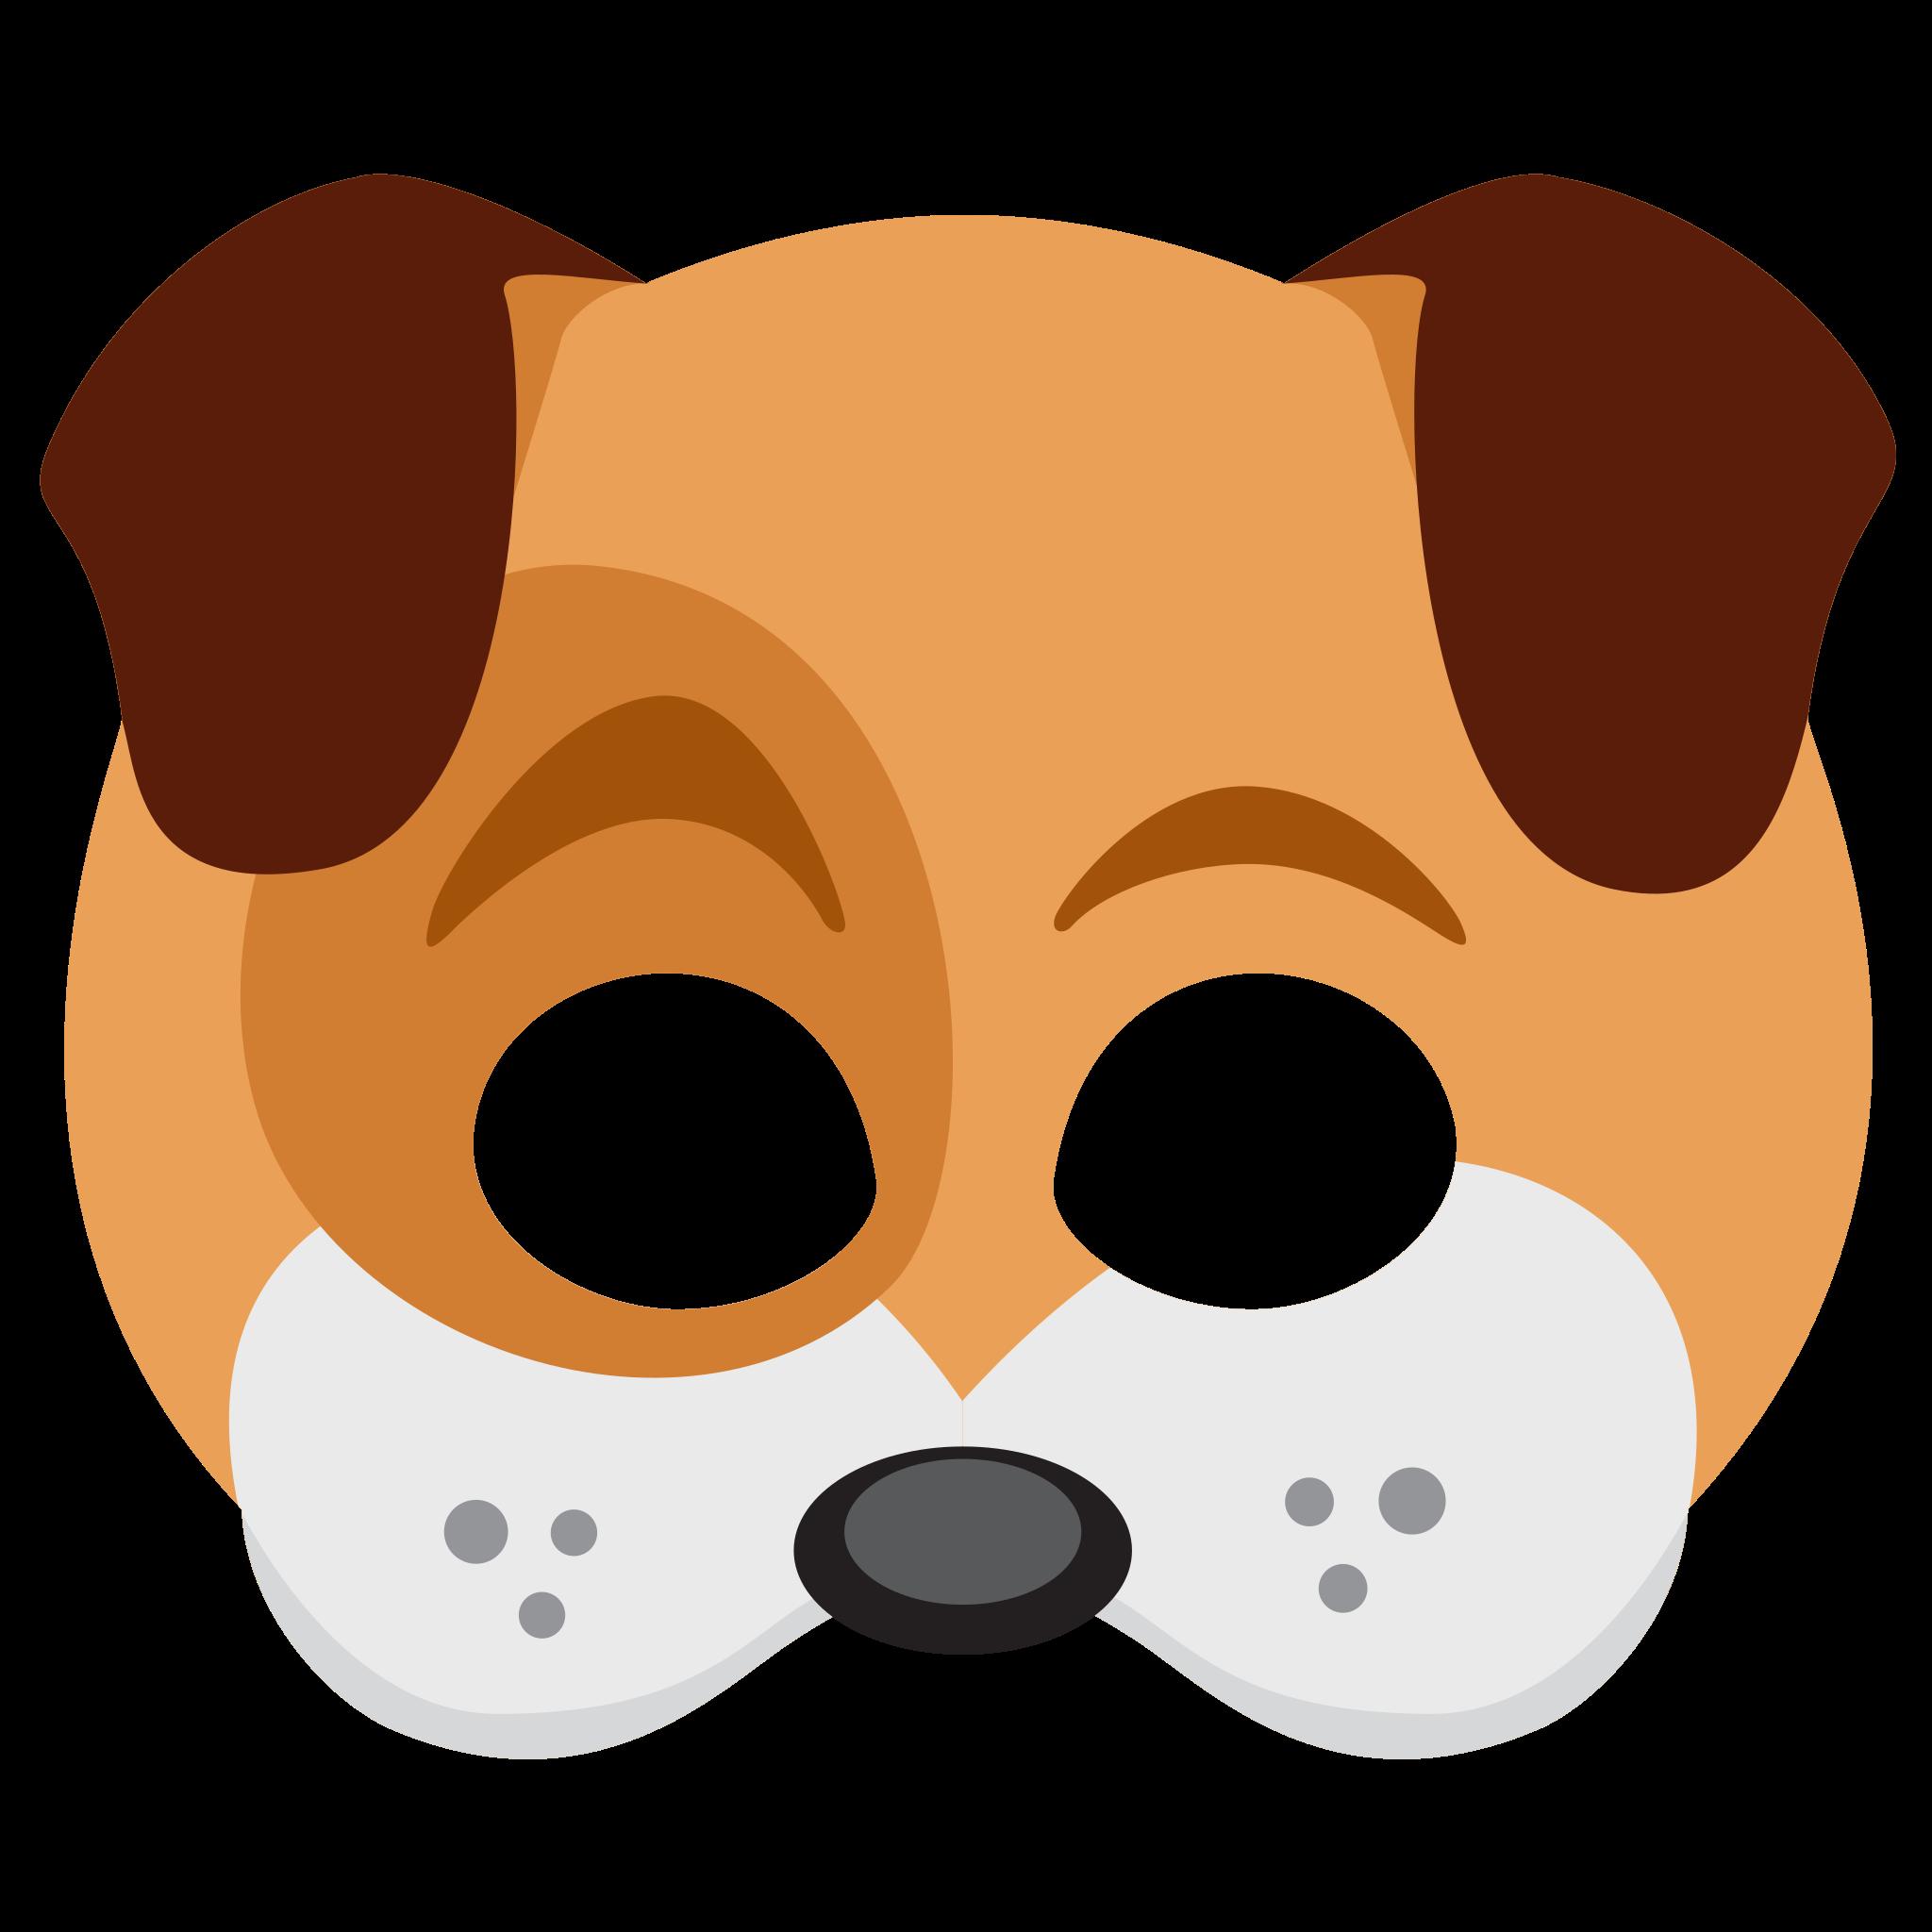 Messenger clipart jpg free library Dog Face Sticker Mask Png Snapchat Messenger jpg free library